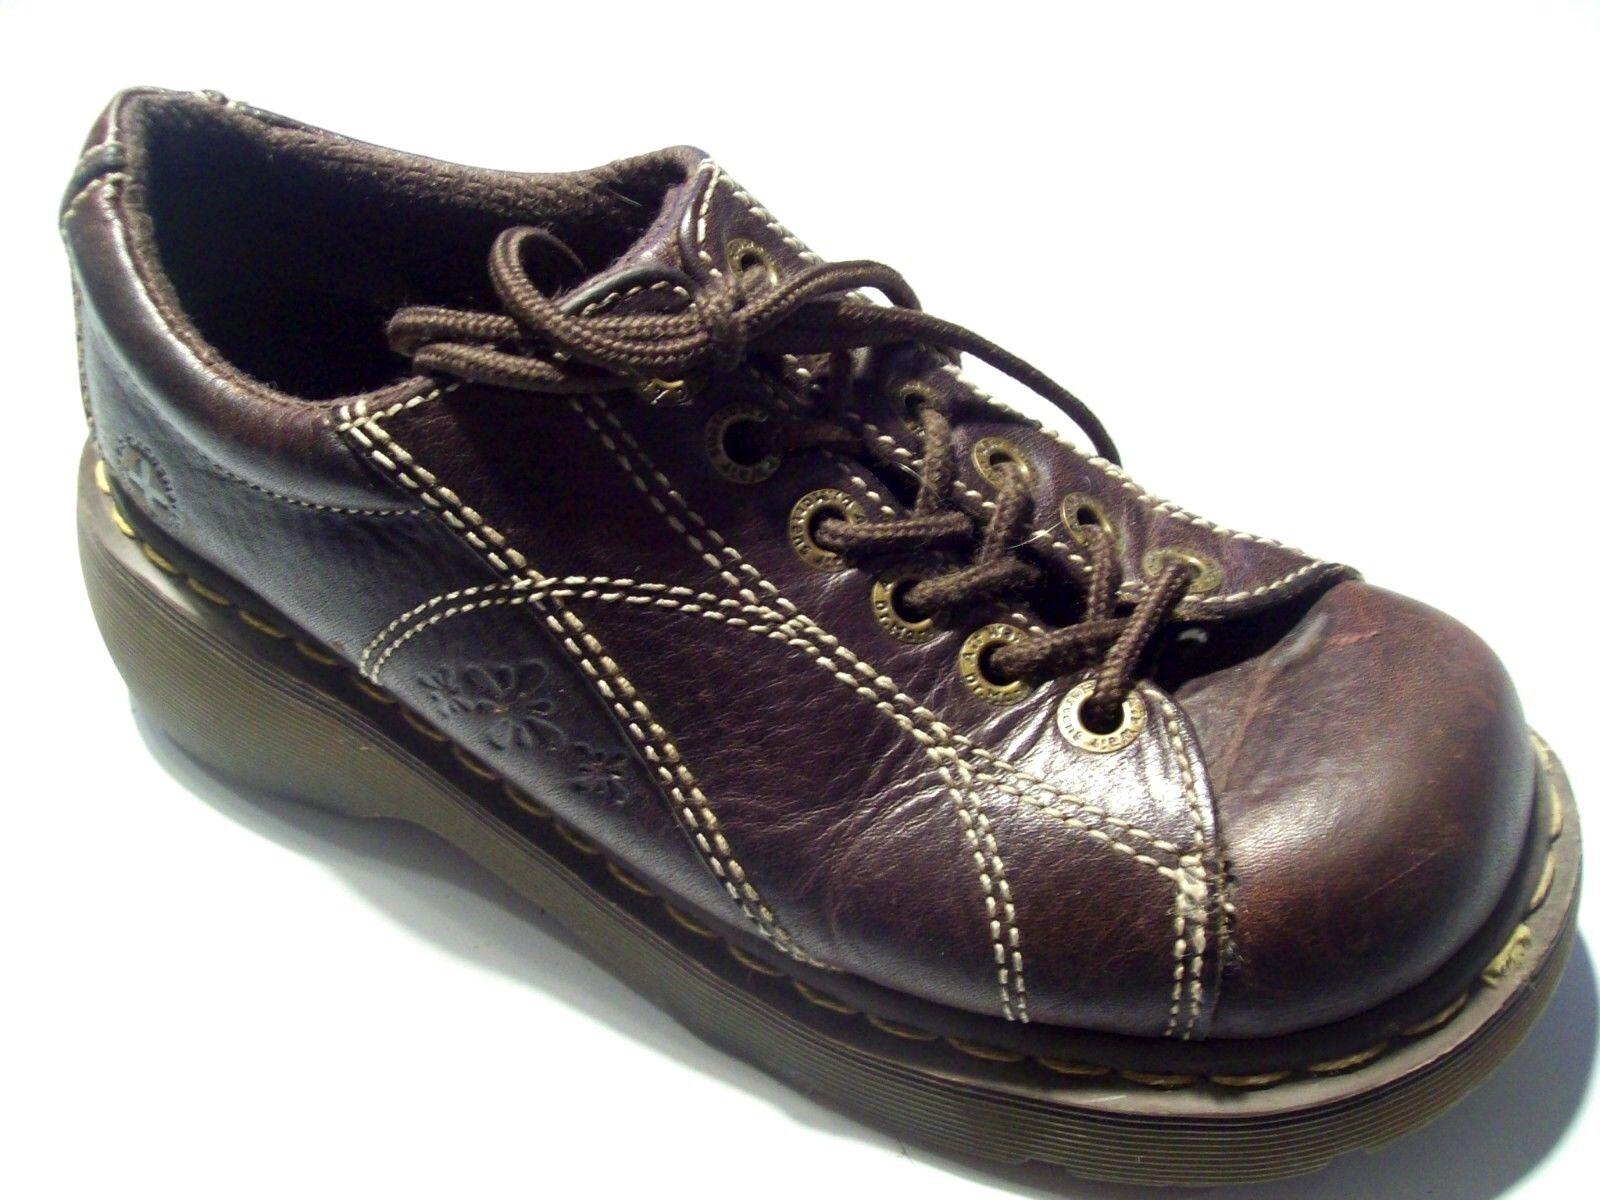 Dr. Marten 12283 Brown Leather Oxfords Platform Flowers Loafers Shoes Size 8